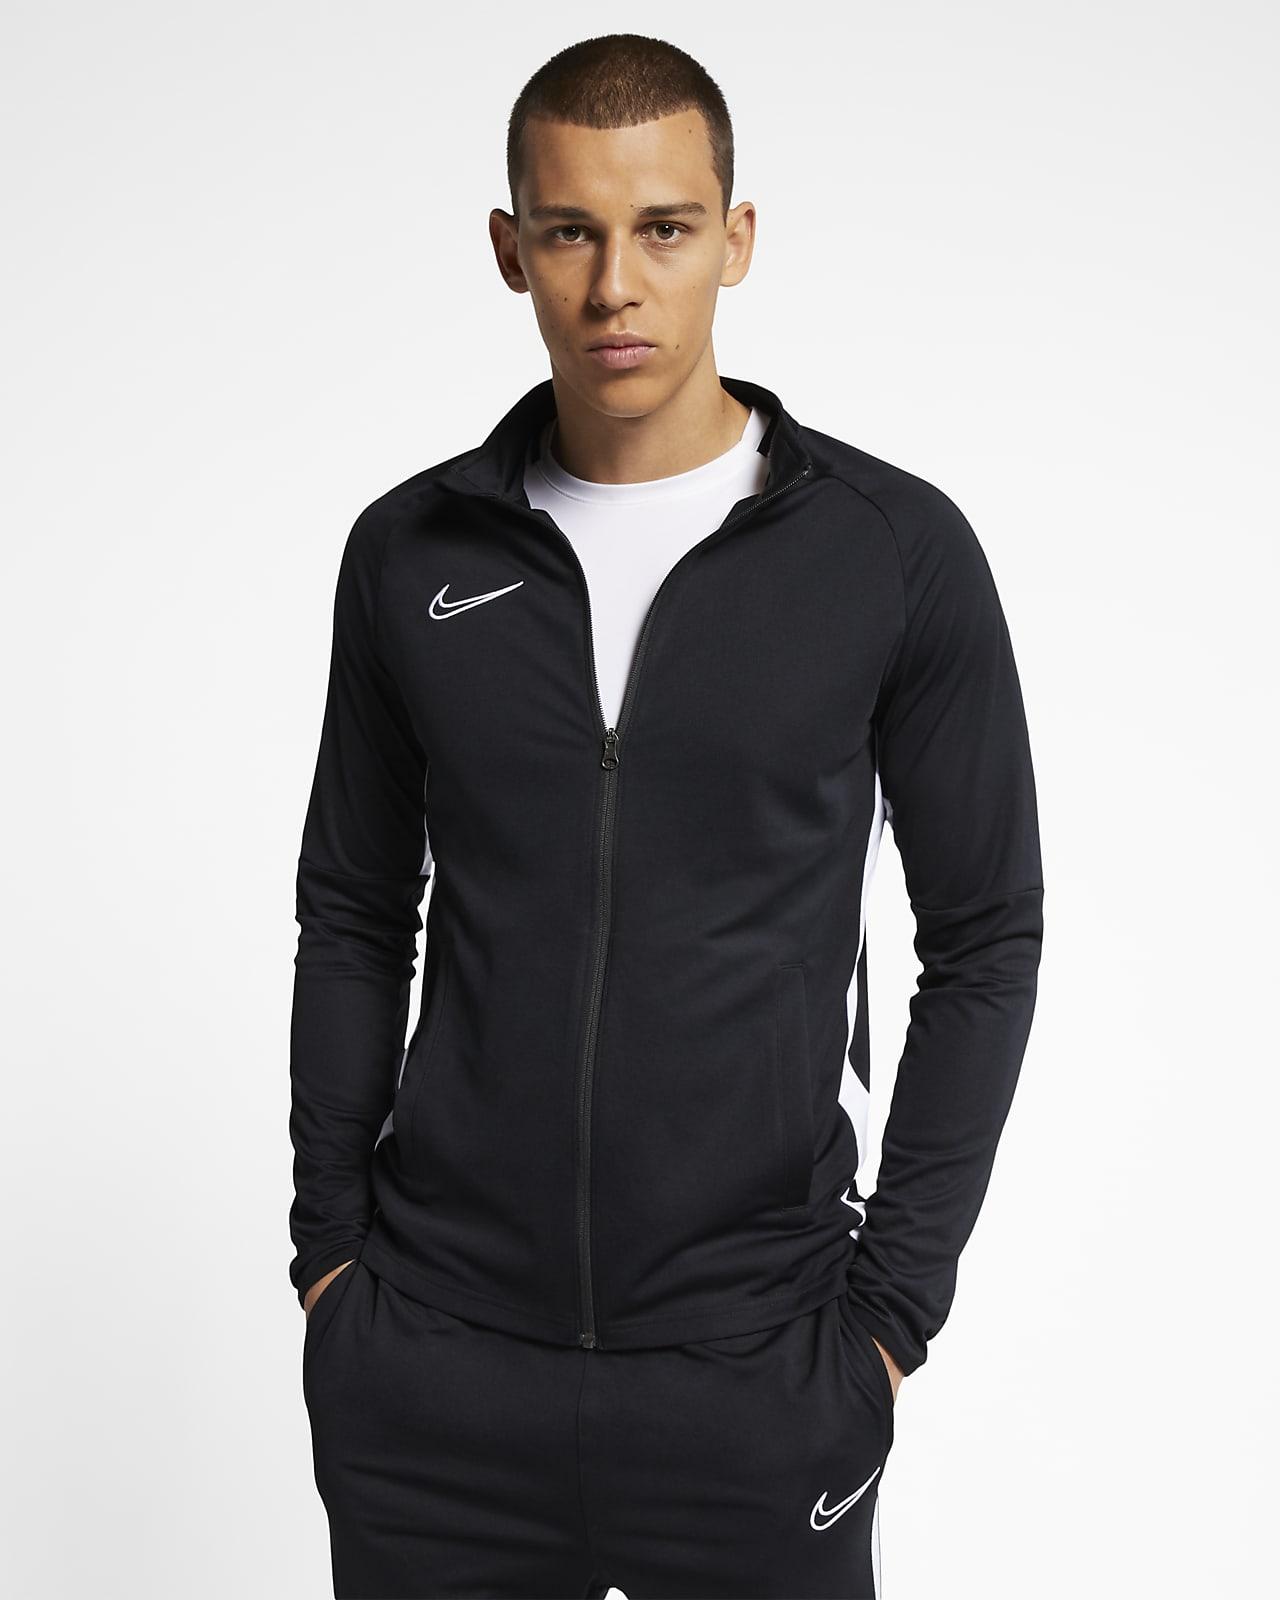 sonrojo bordado carbón  Nike Dri-FIT Academy Men's Football Tracksuit. Nike LU